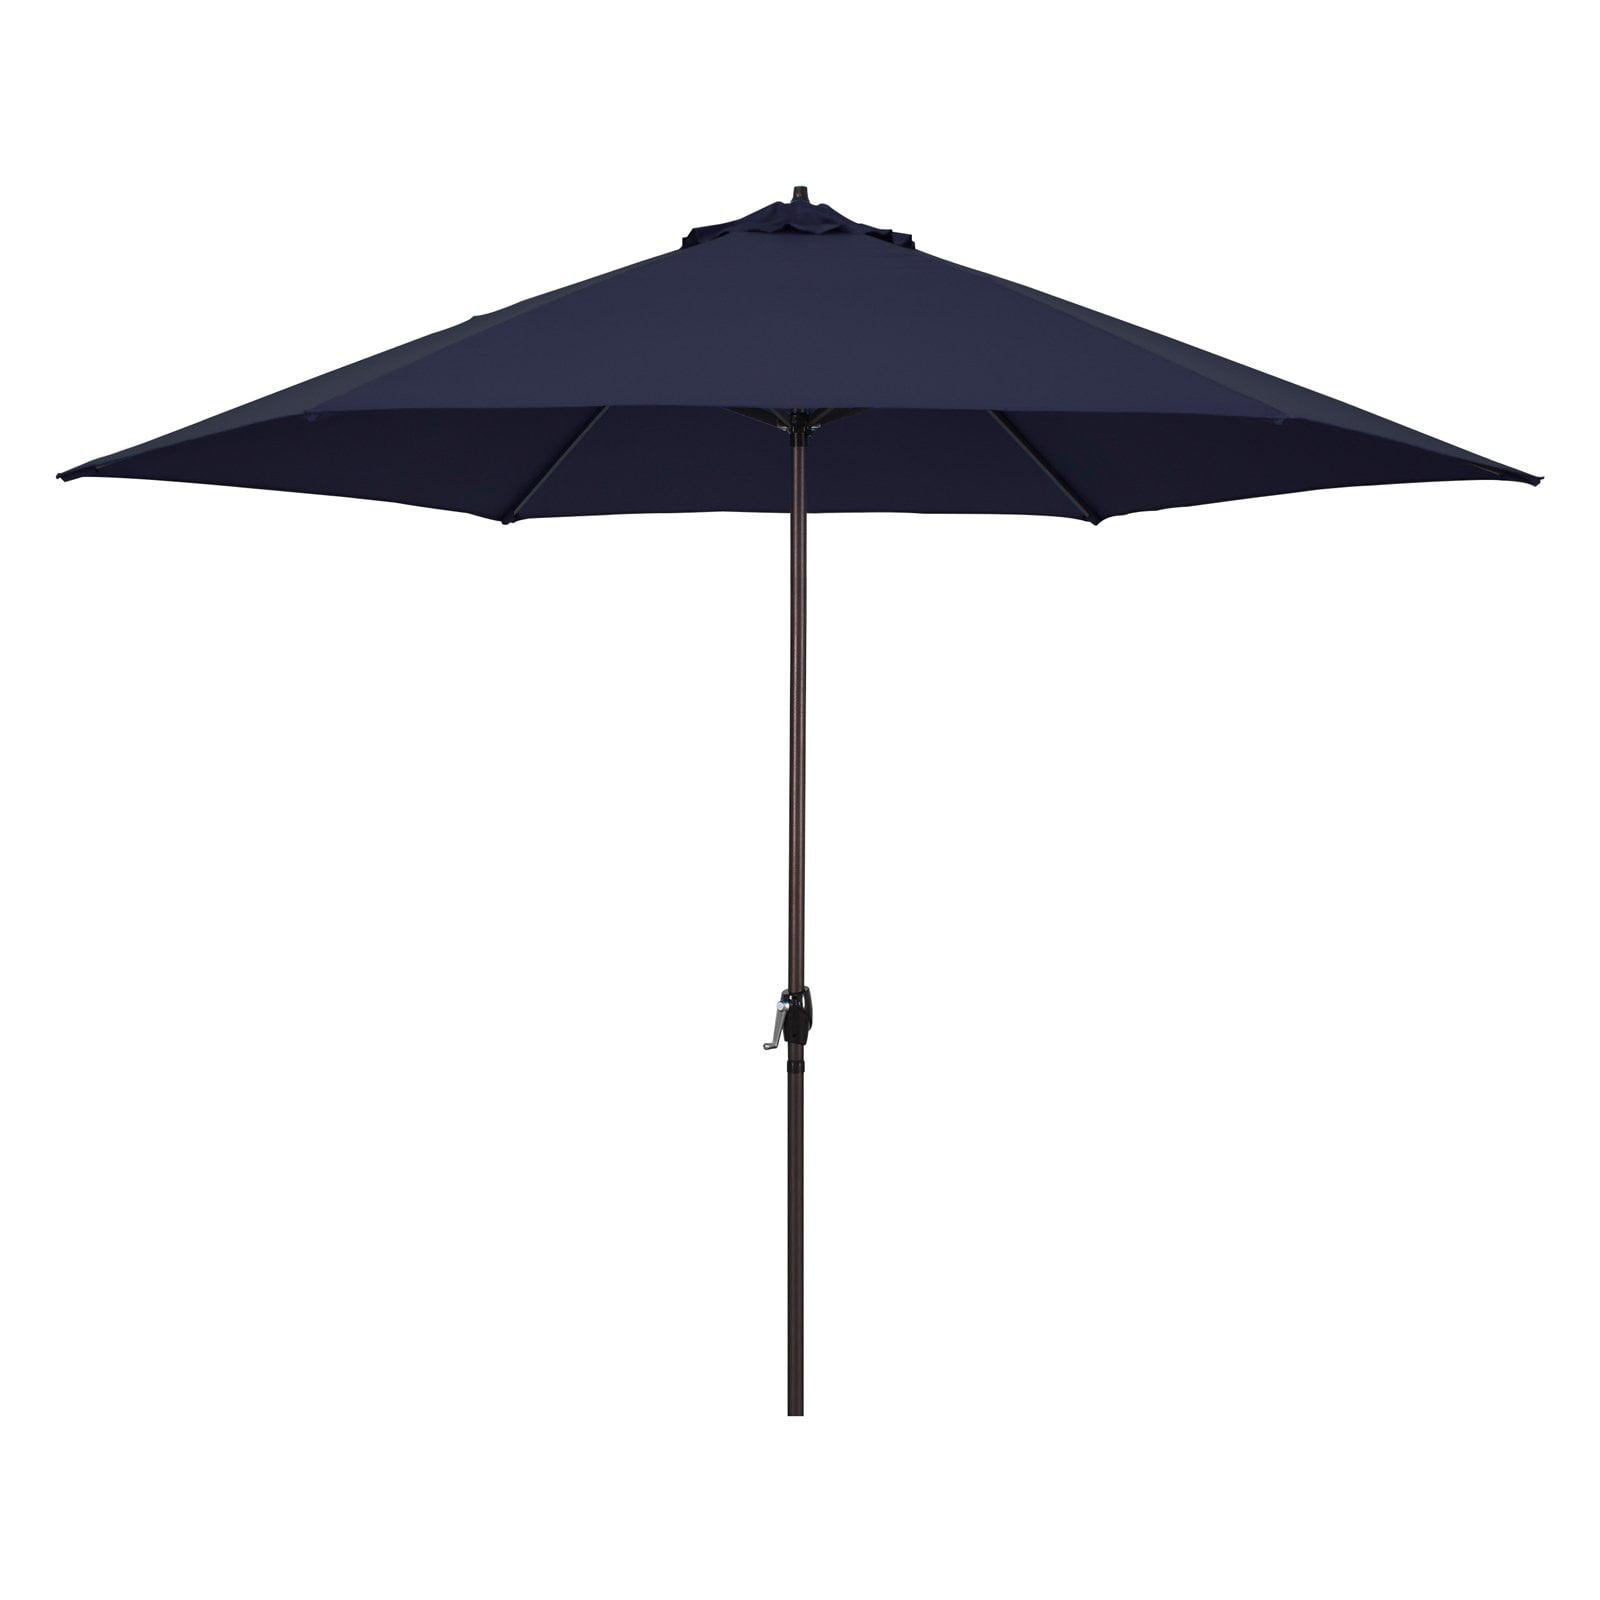 Astella Luna 11 ft. Aluminum Polyester Market Patio Umbrella by Overstock